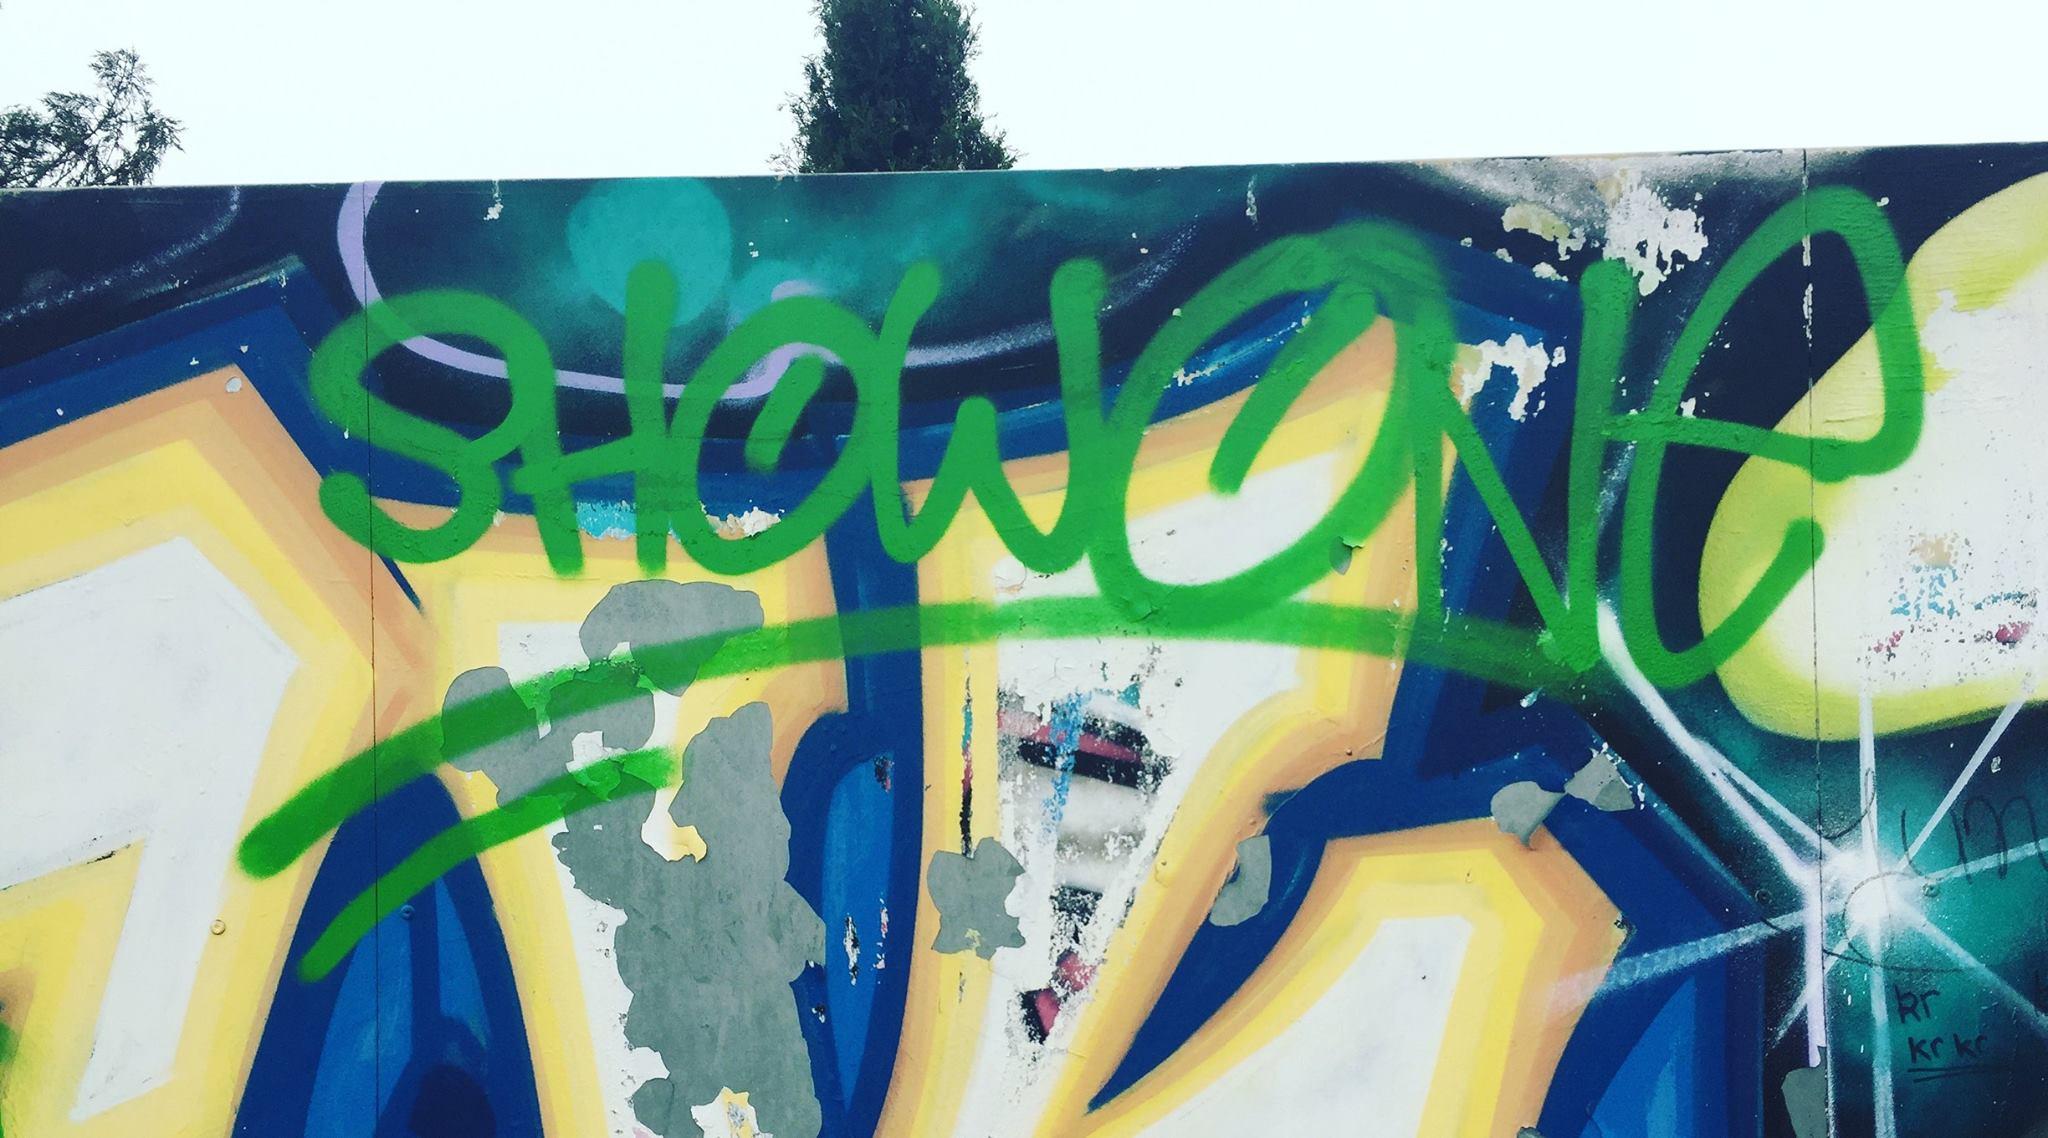 graffiti tag showone